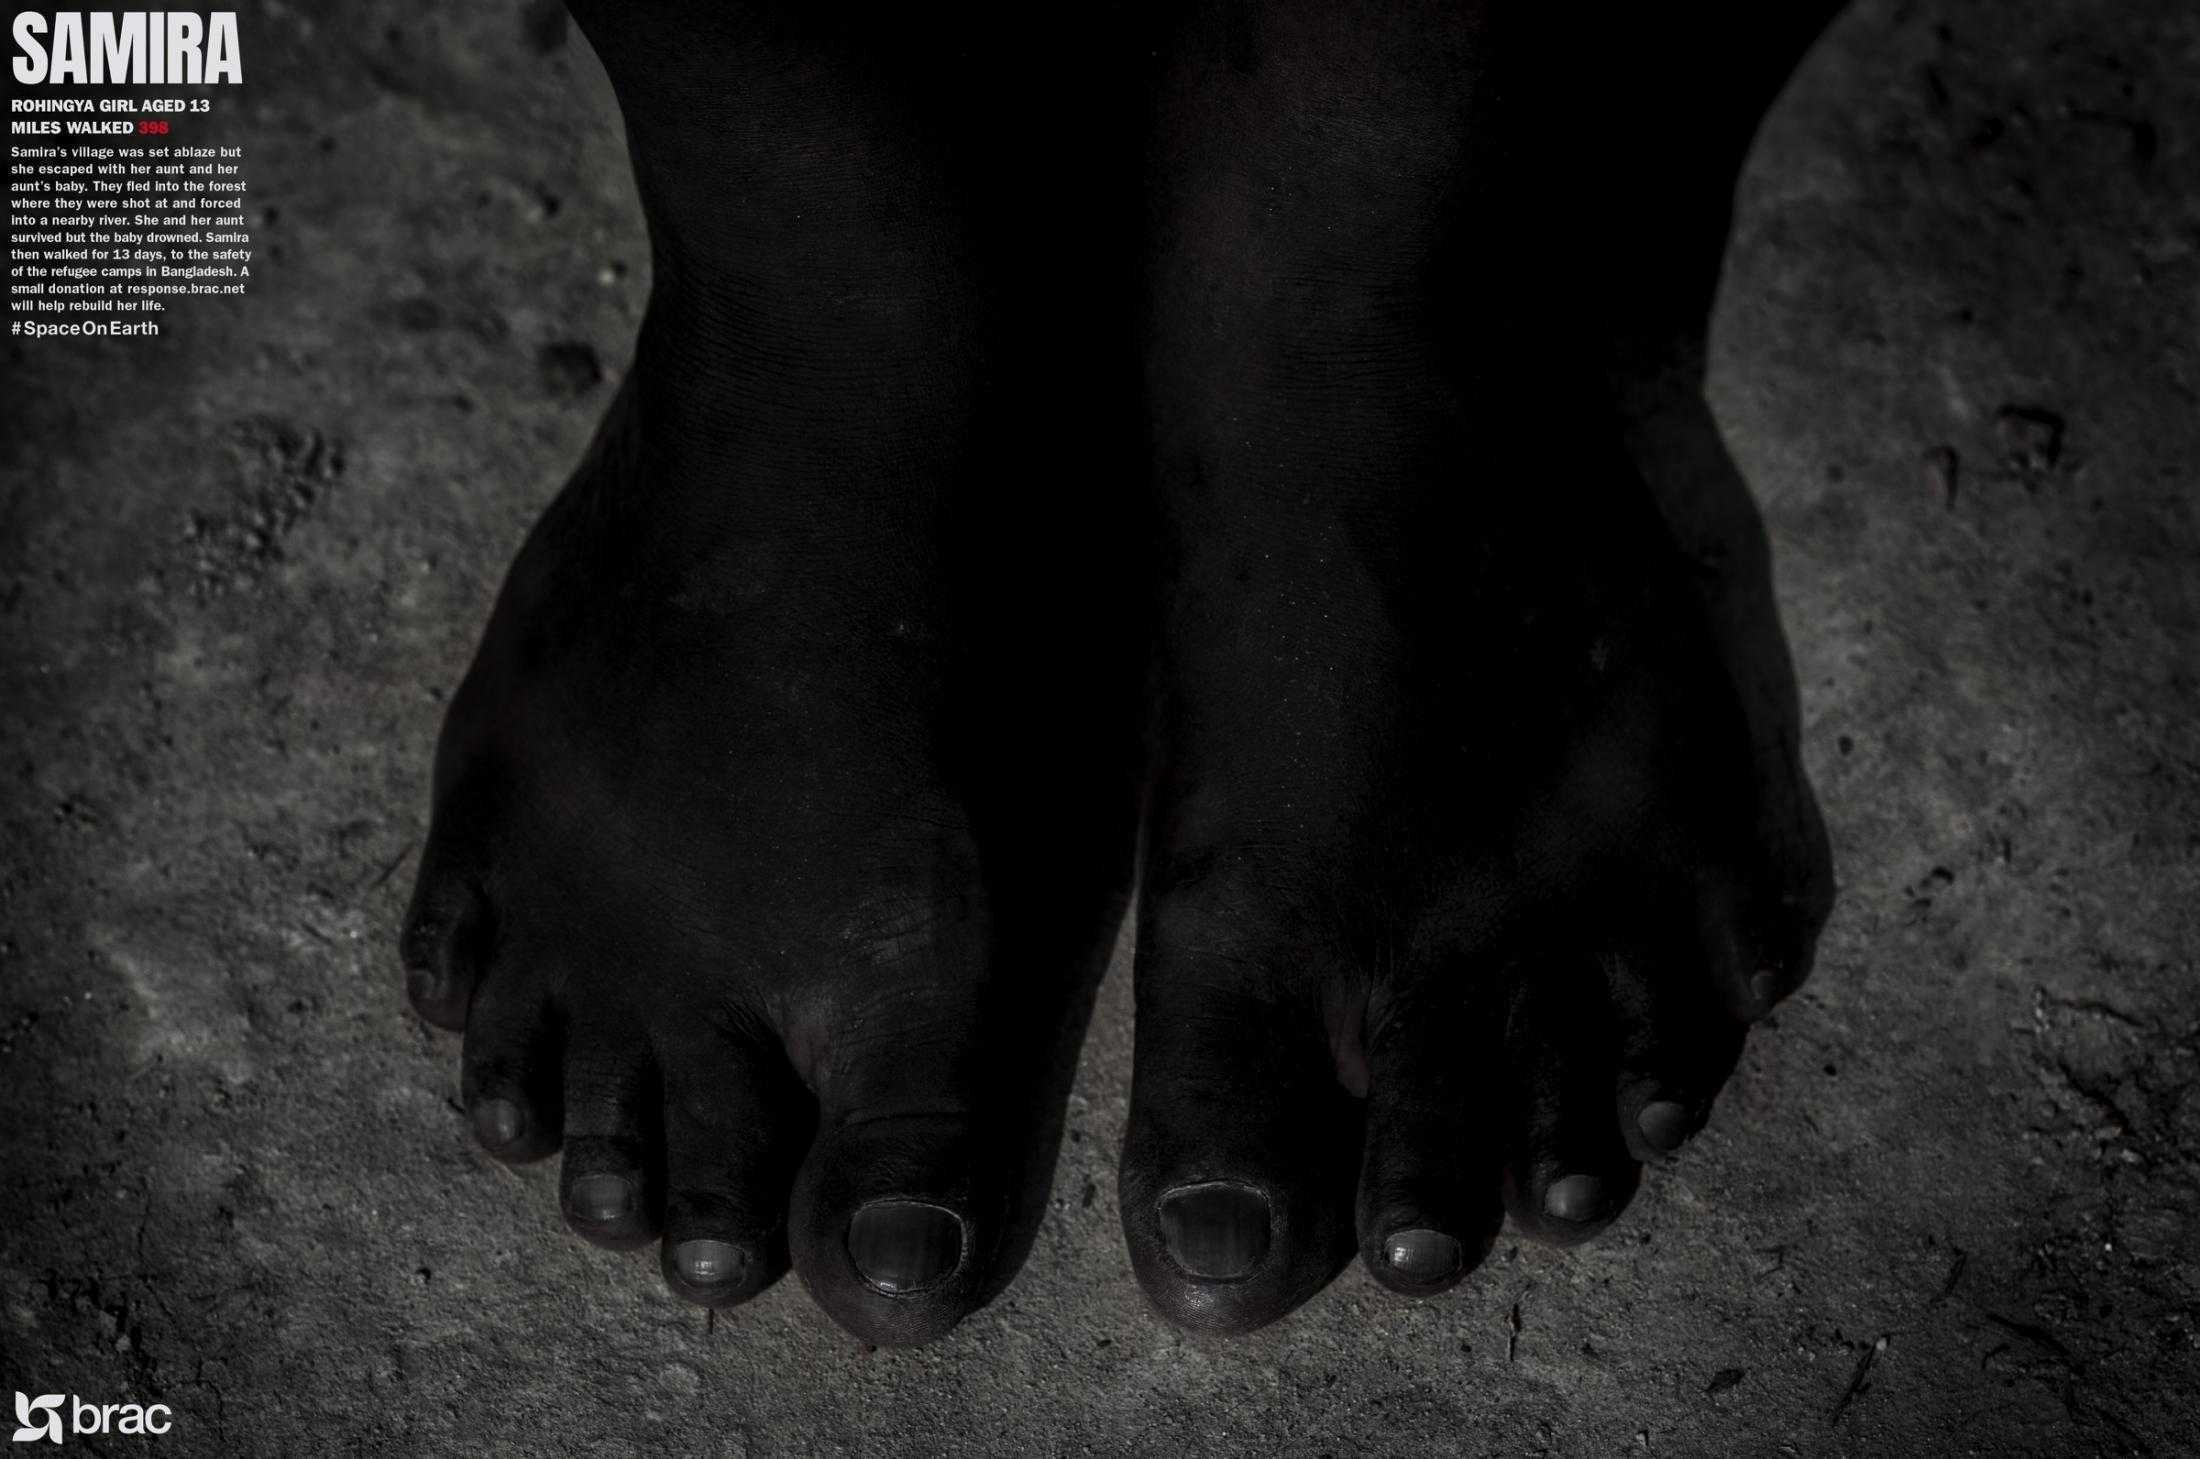 feet_r14_brac4_thumb